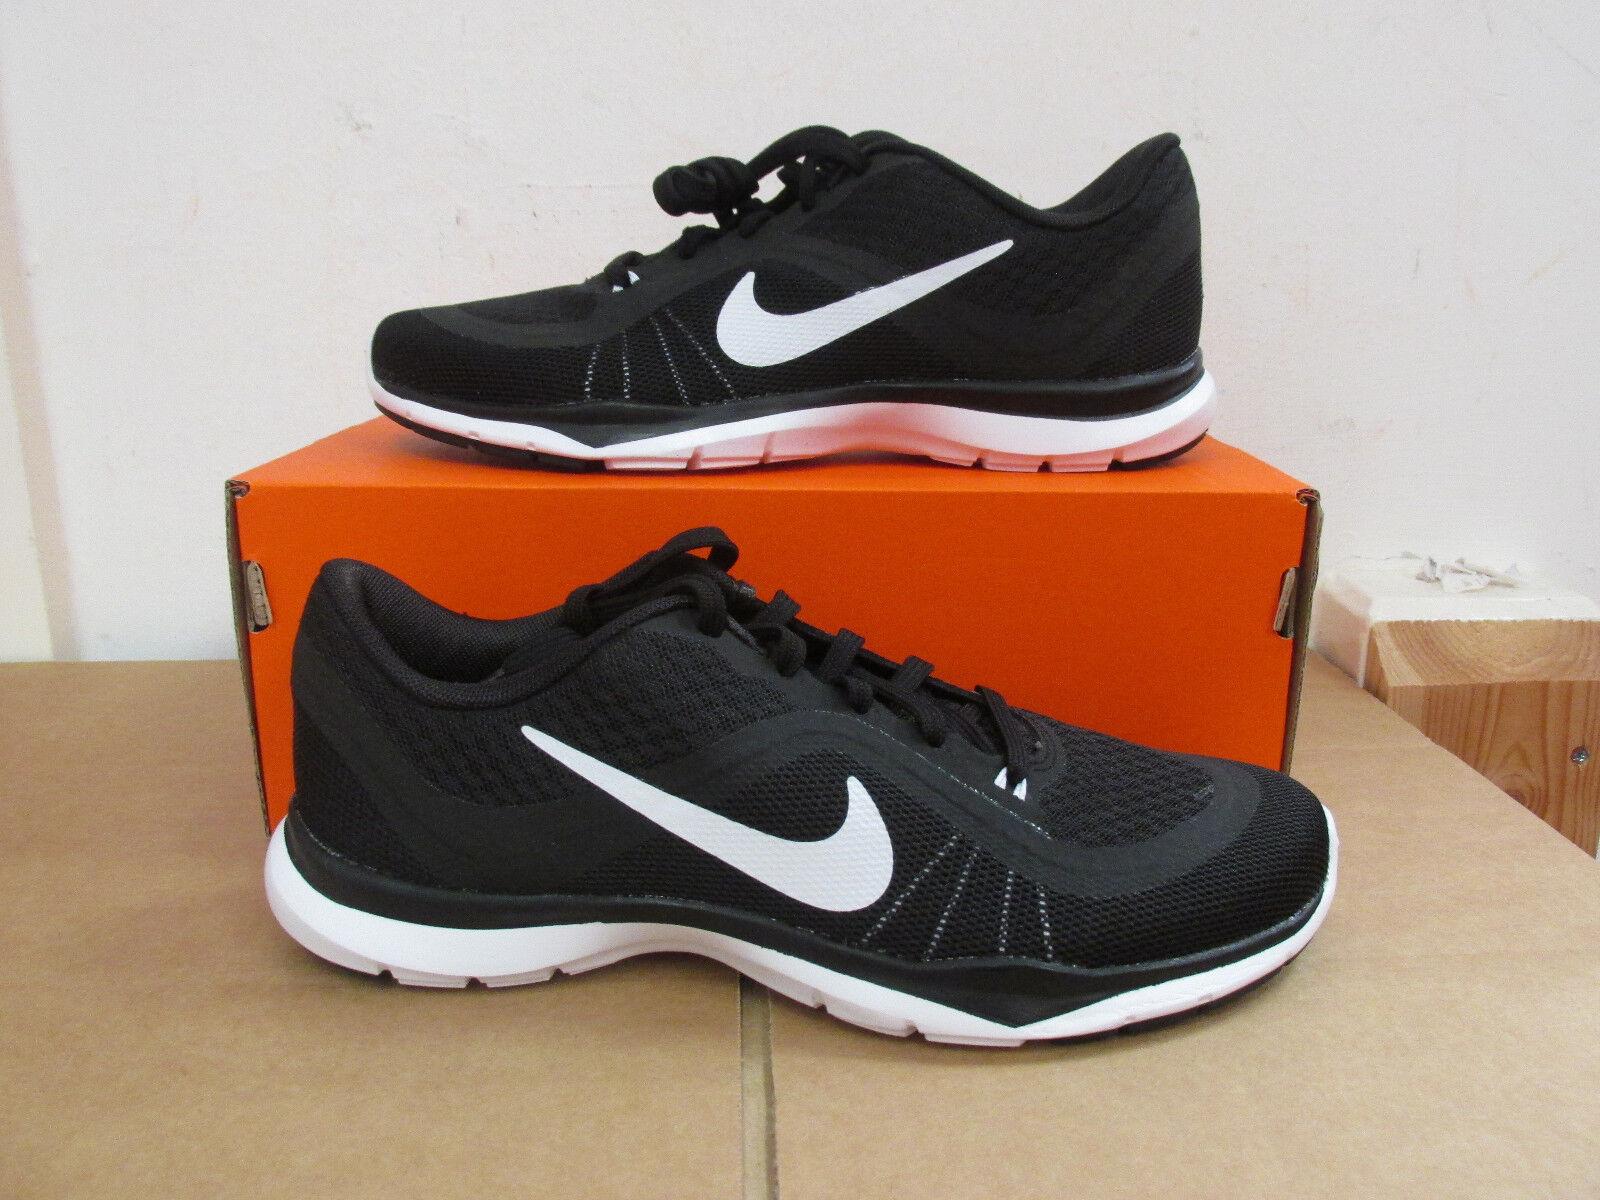 Nike flex trainer 6 trainers ginnastica 831217 001 scarpe da ginnastica trainers shoes CLEARANCE 5dd836